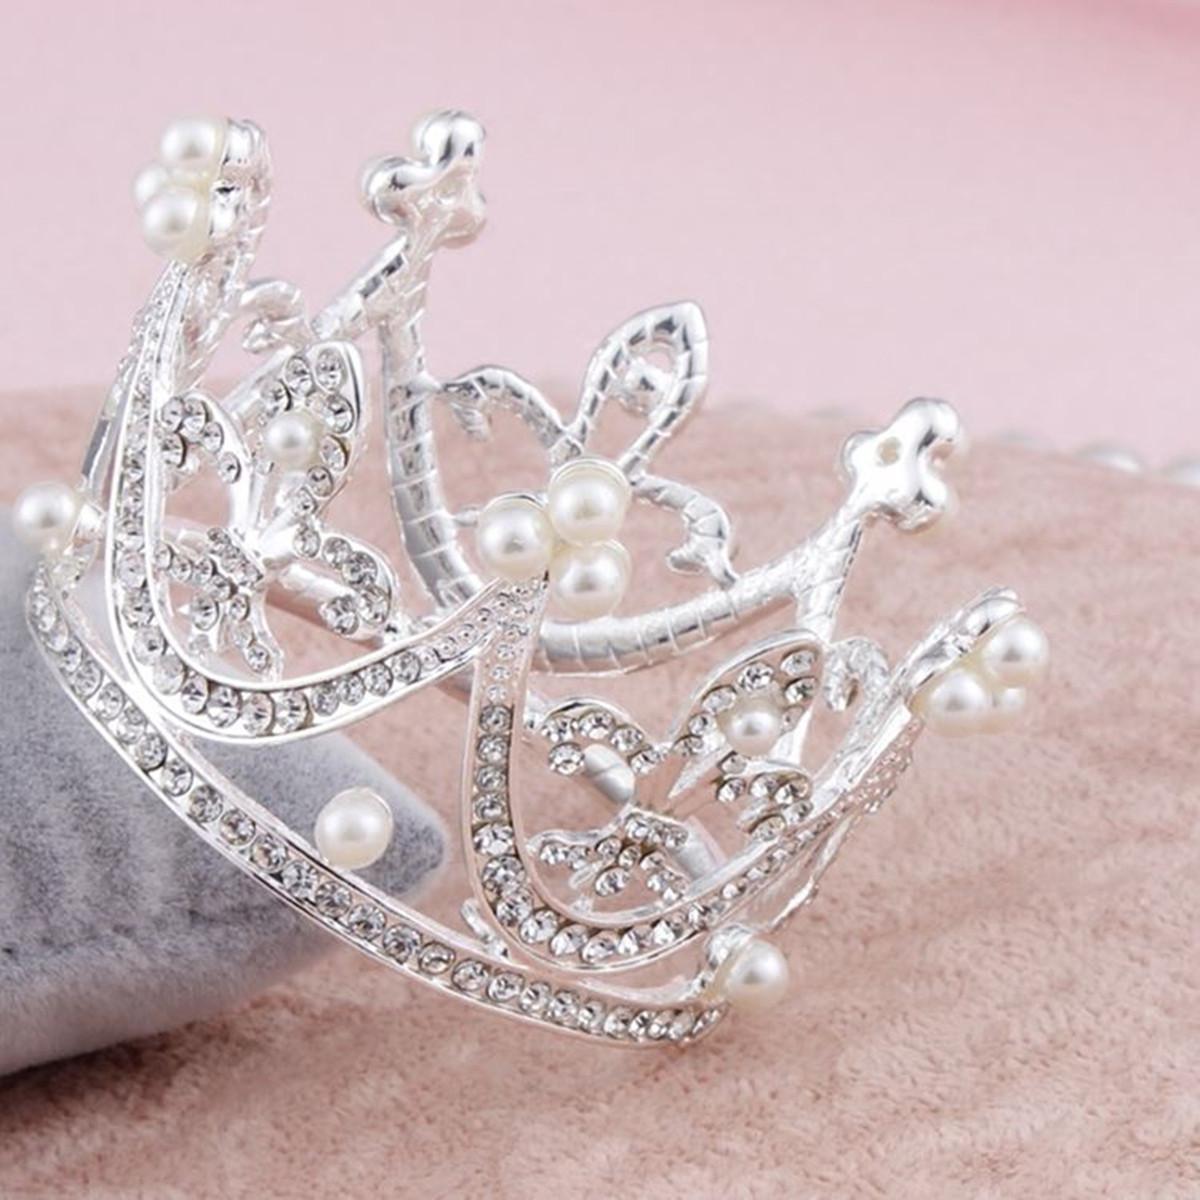 Bride Gold Rhinestone Crystal Coral Shape Crown Princess Queen Tiara Wedding Party Prom Headpiece. Source